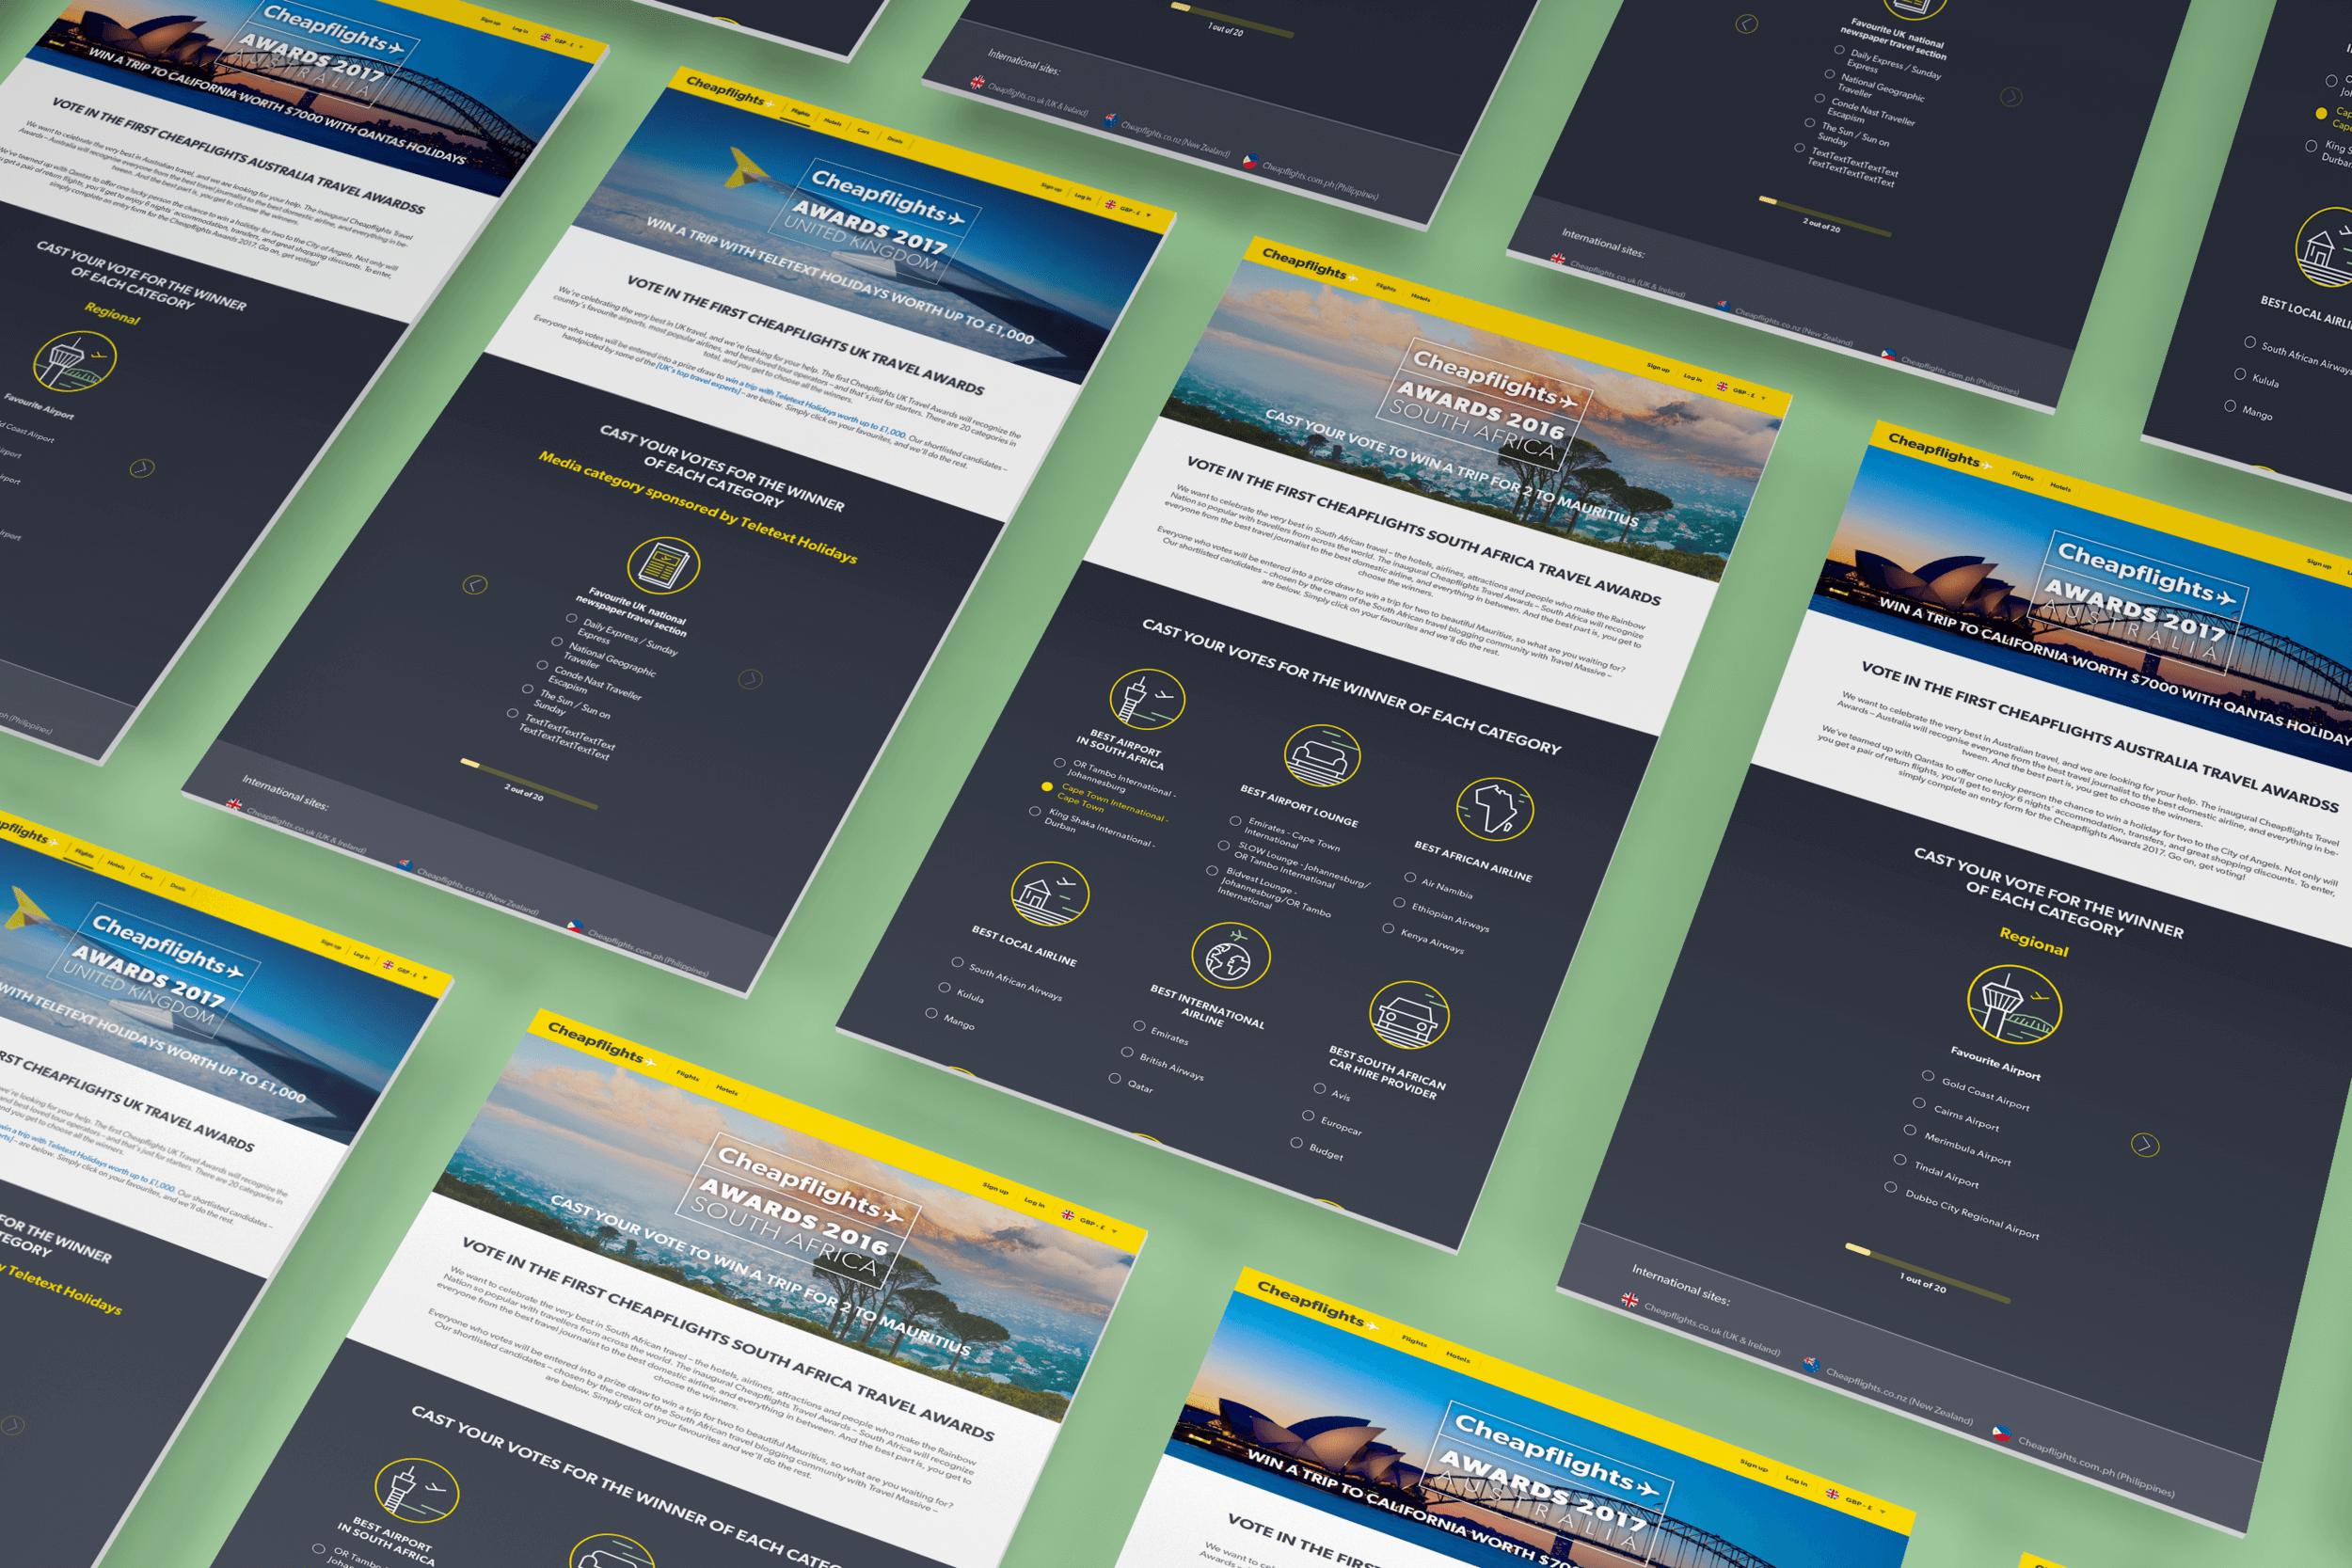 cf-awards-landing-page-mockup-dk-markets.png